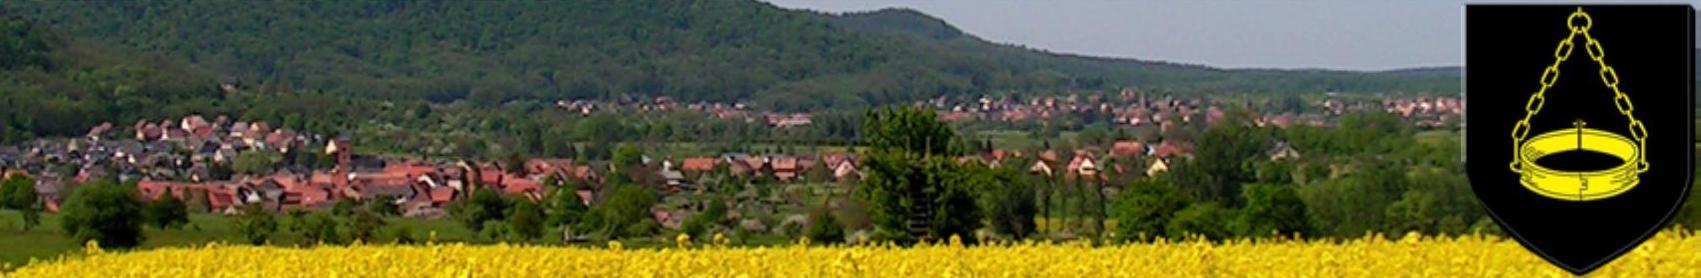 Commune de Dossenheim sur Zinsel